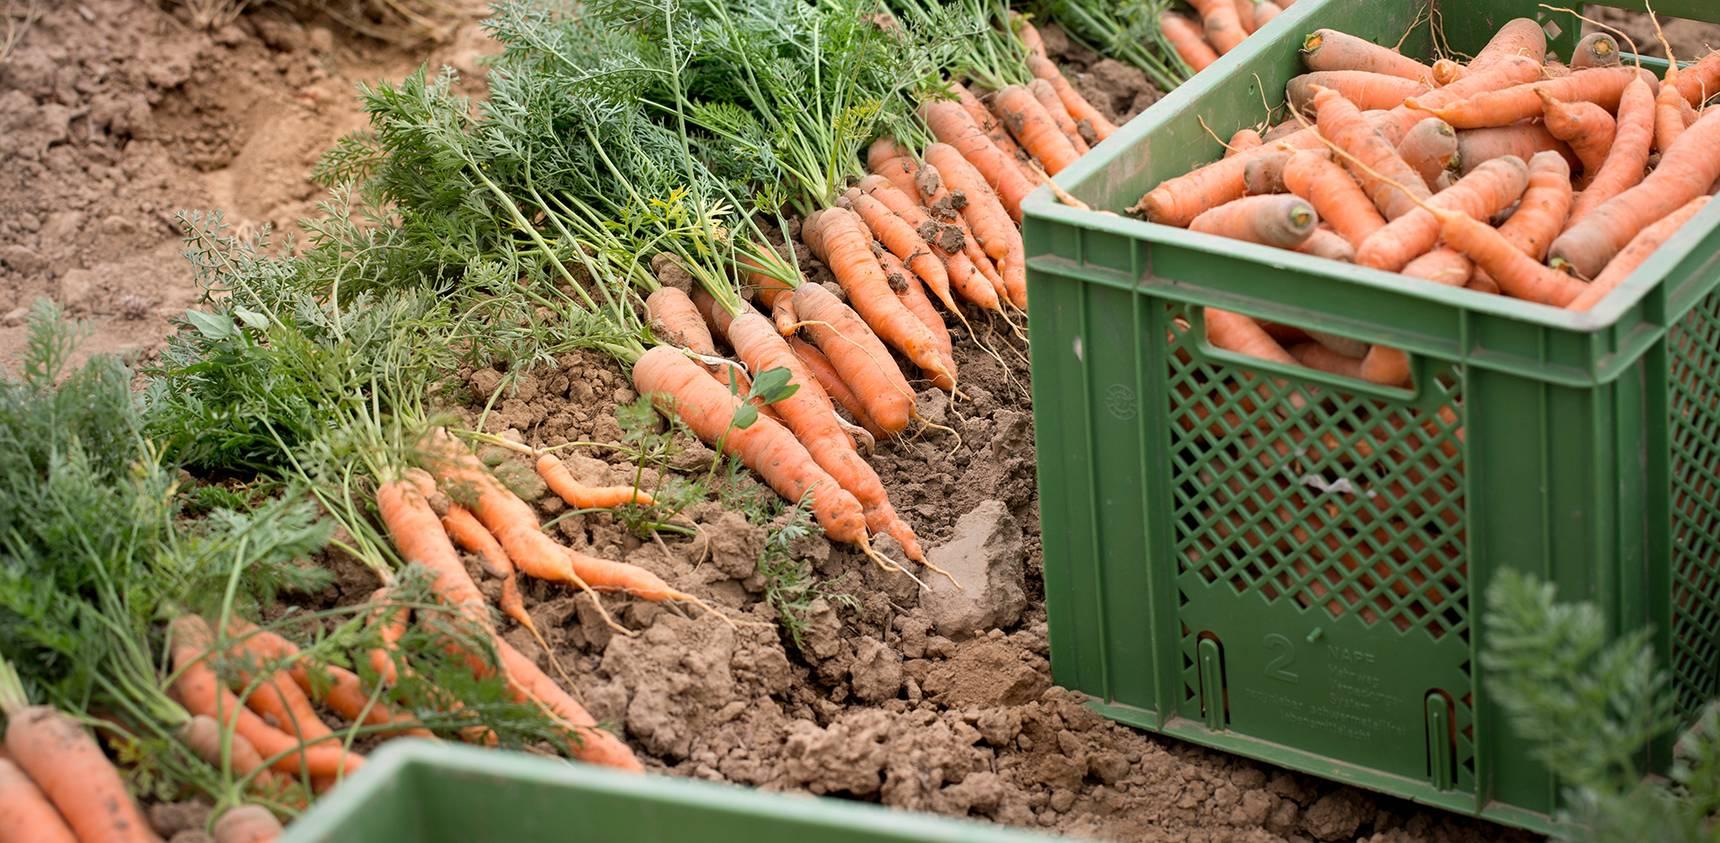 Demeter Felderzeugnisse Impression Karotten